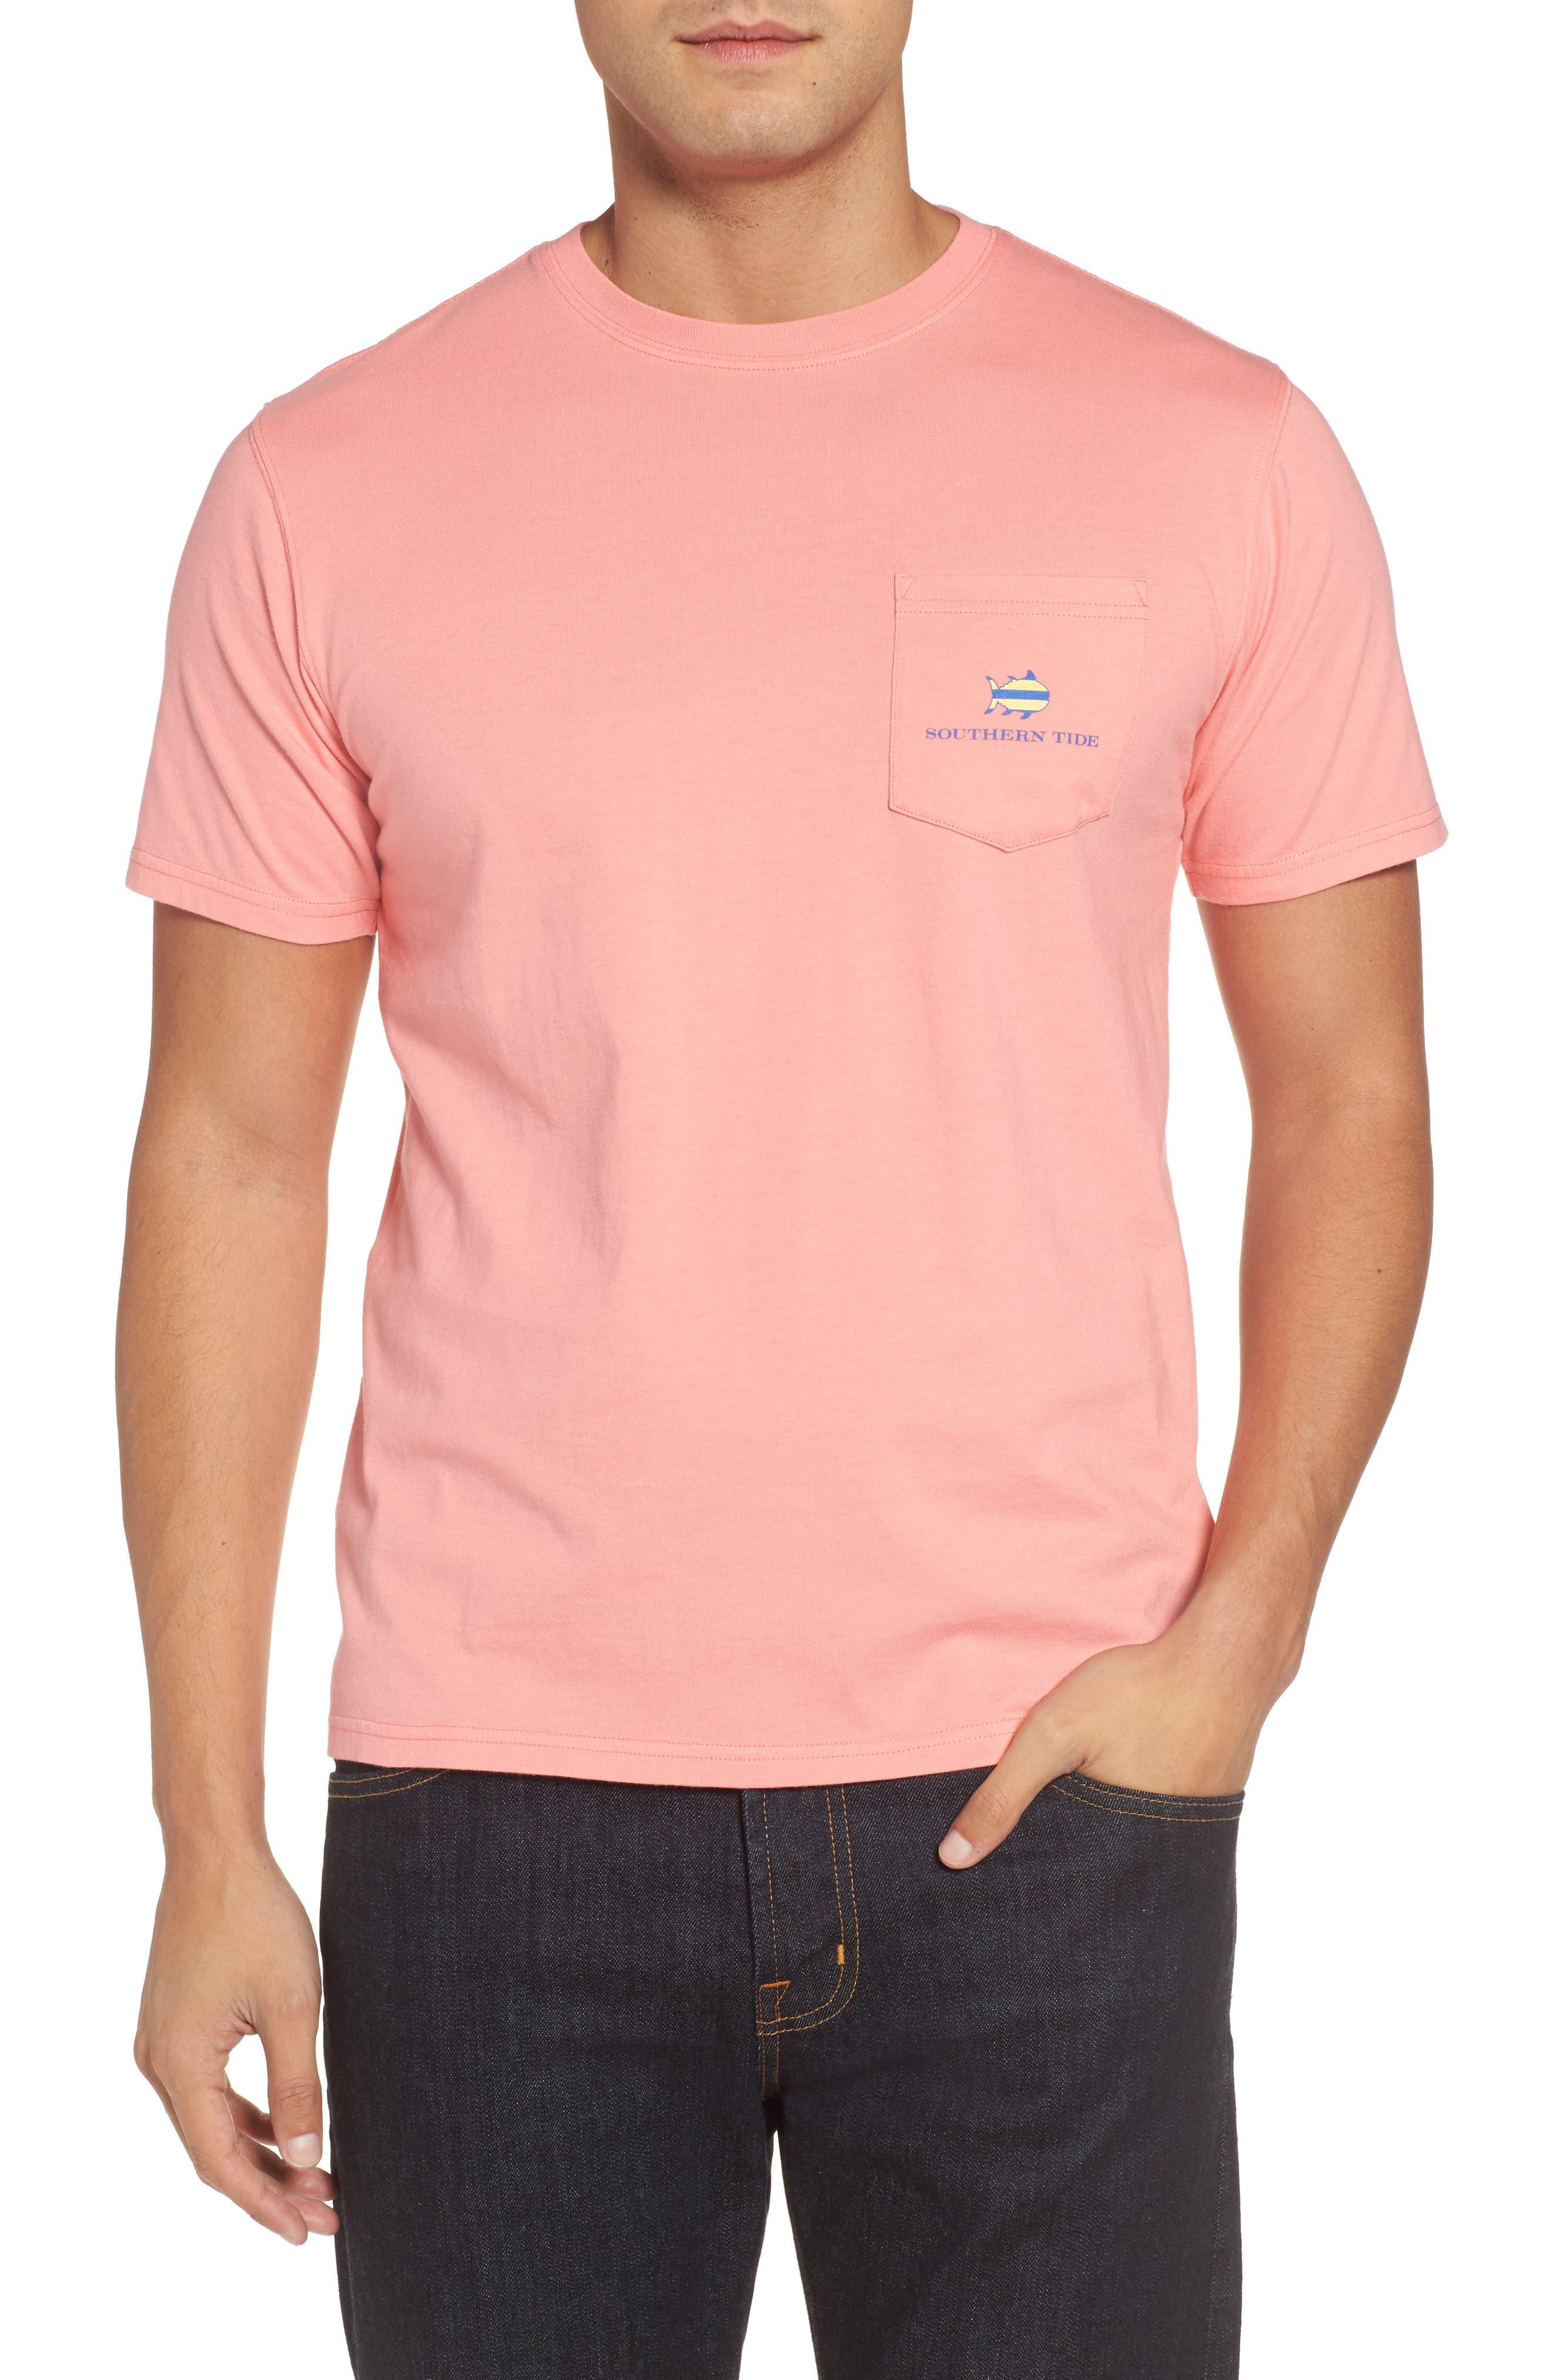 Southern Tide Paradise T-Shirt